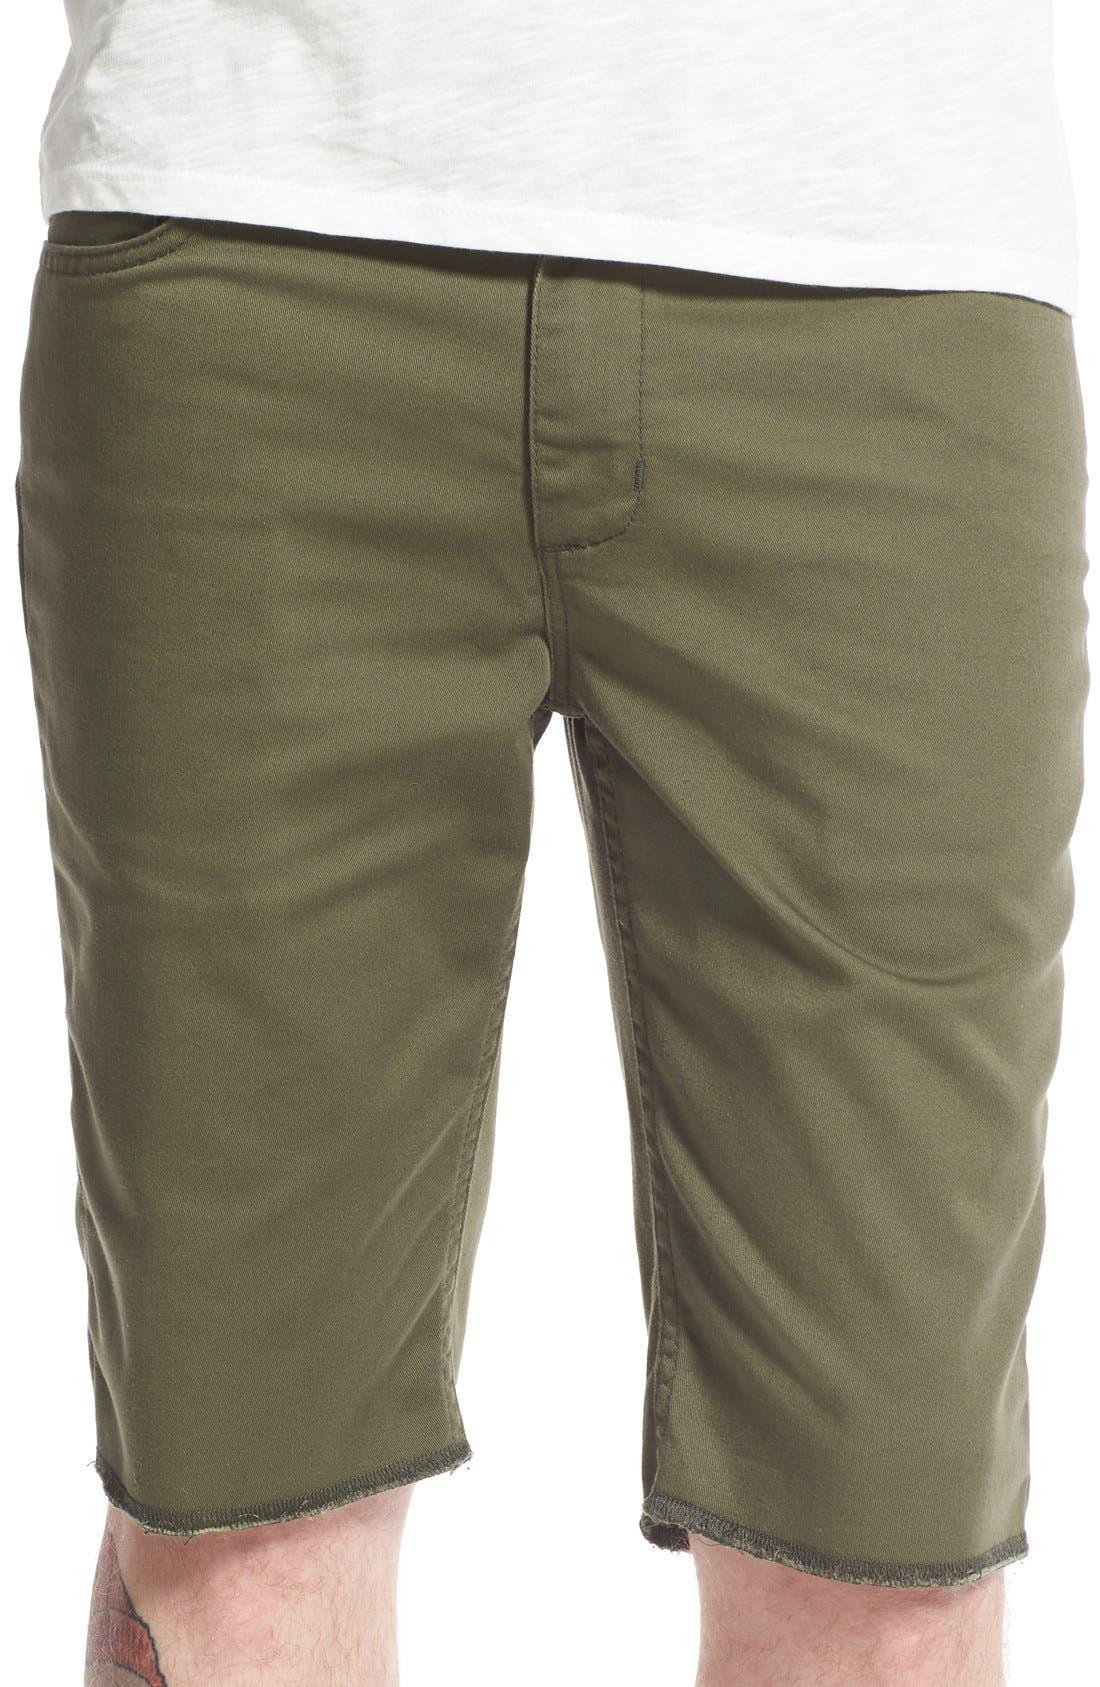 'Covina II - Anthony Van Engelen' Twill Shorts,                             Main thumbnail 1, color,                             Grape Leaf